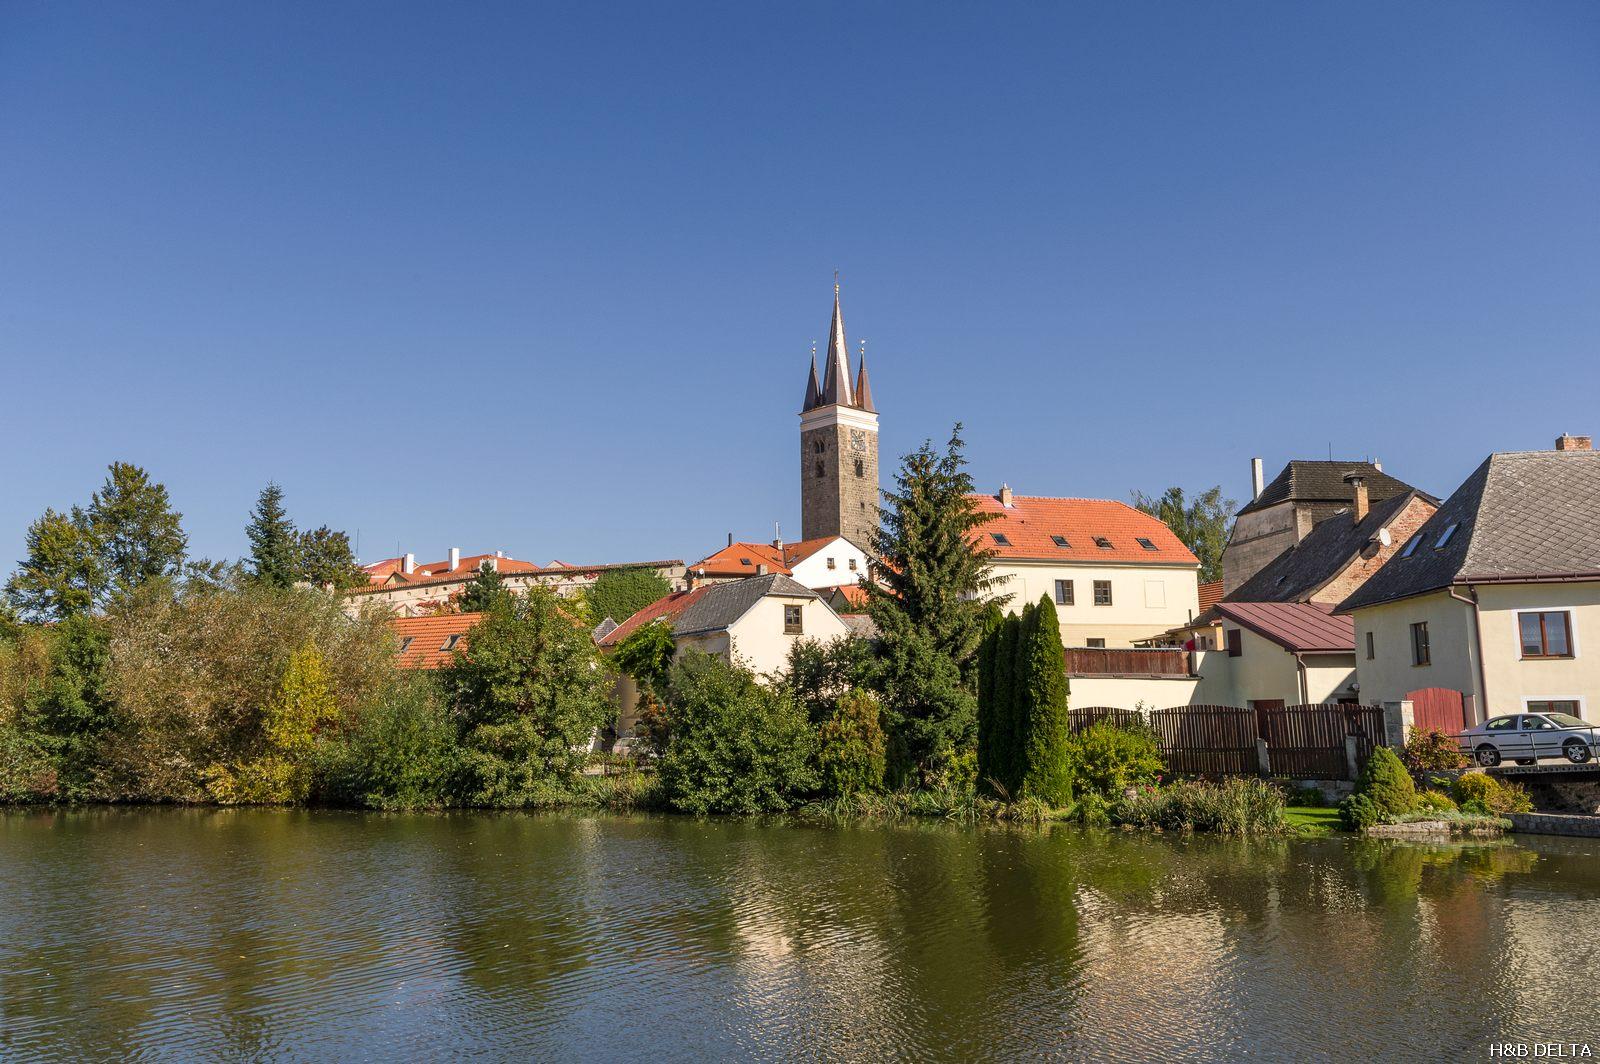 Věž kostela sv. Ducha v Telči